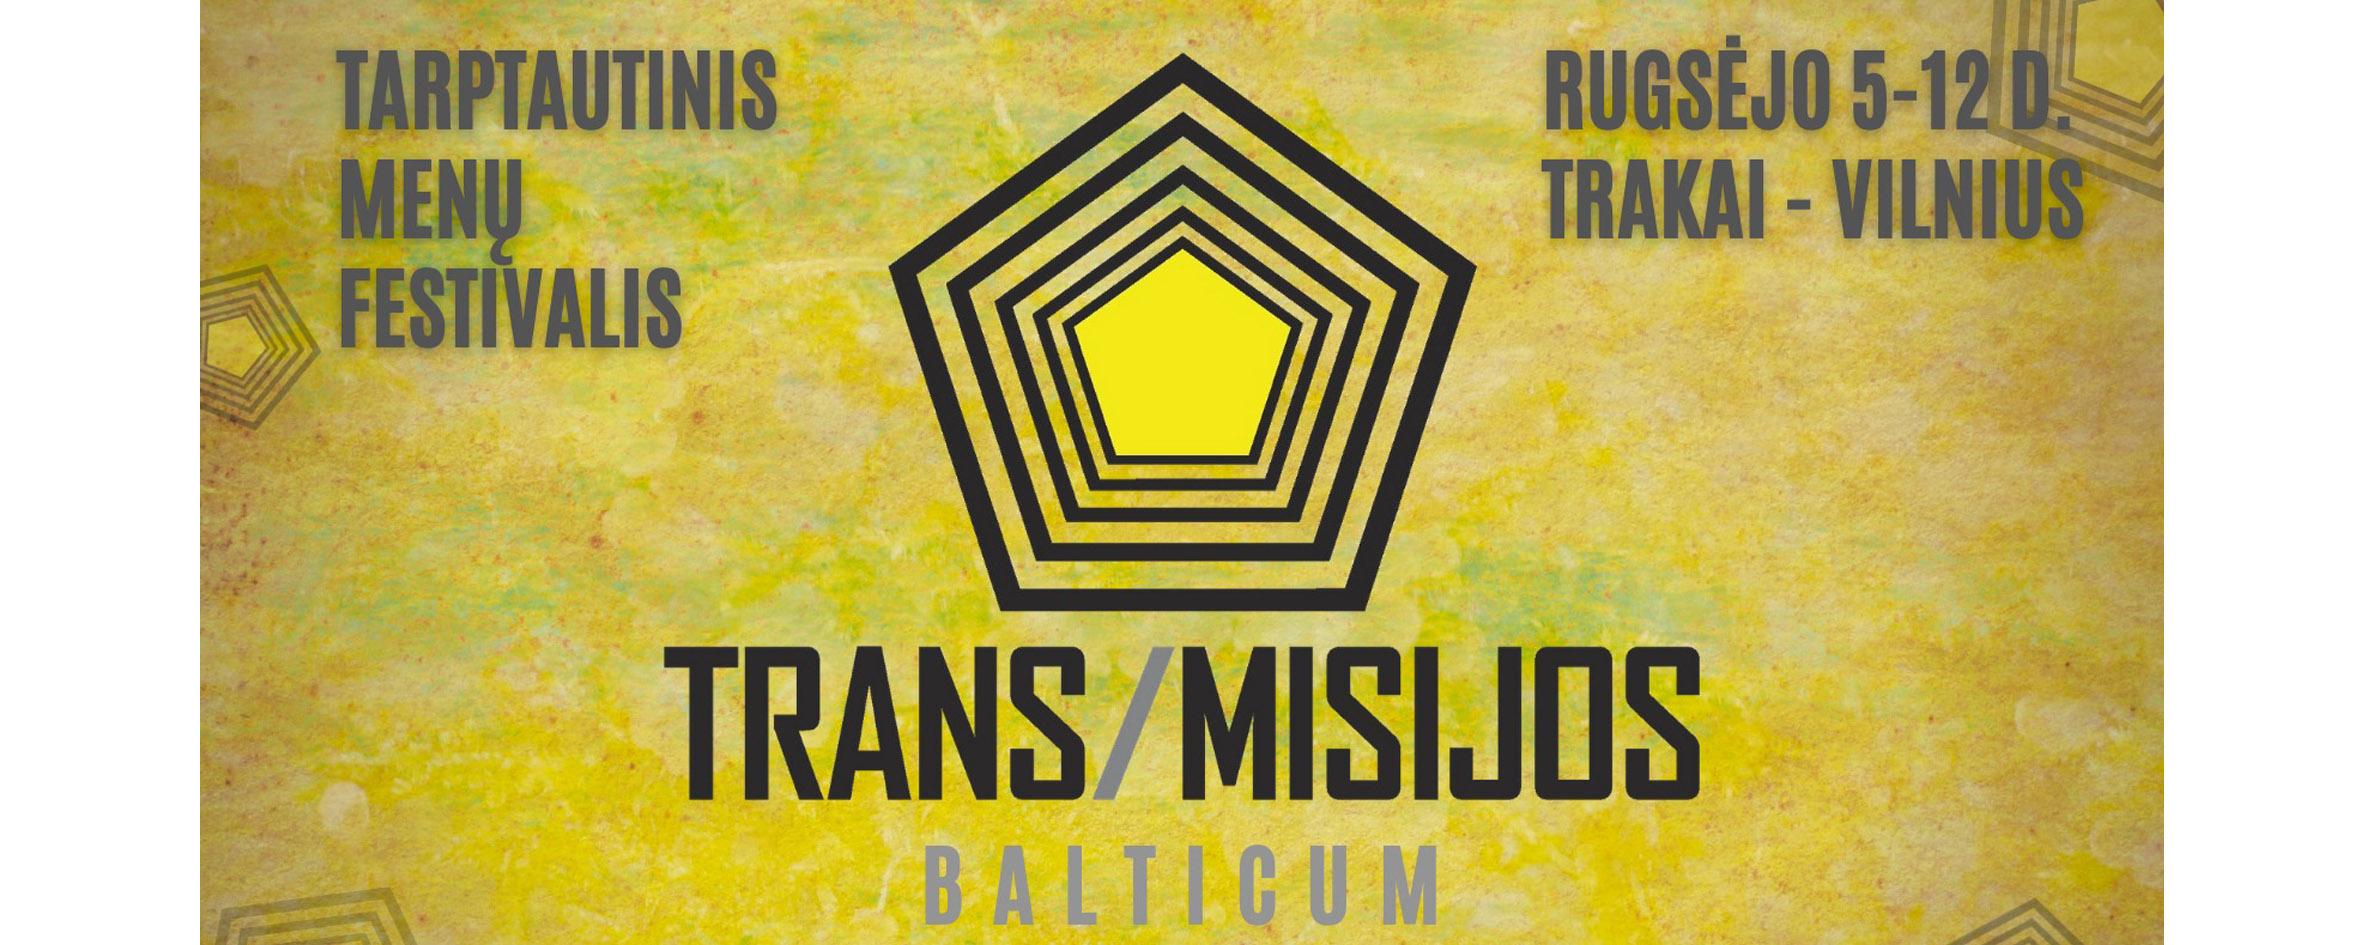 Czas na TRANS/MISIJOS BALTICUM!